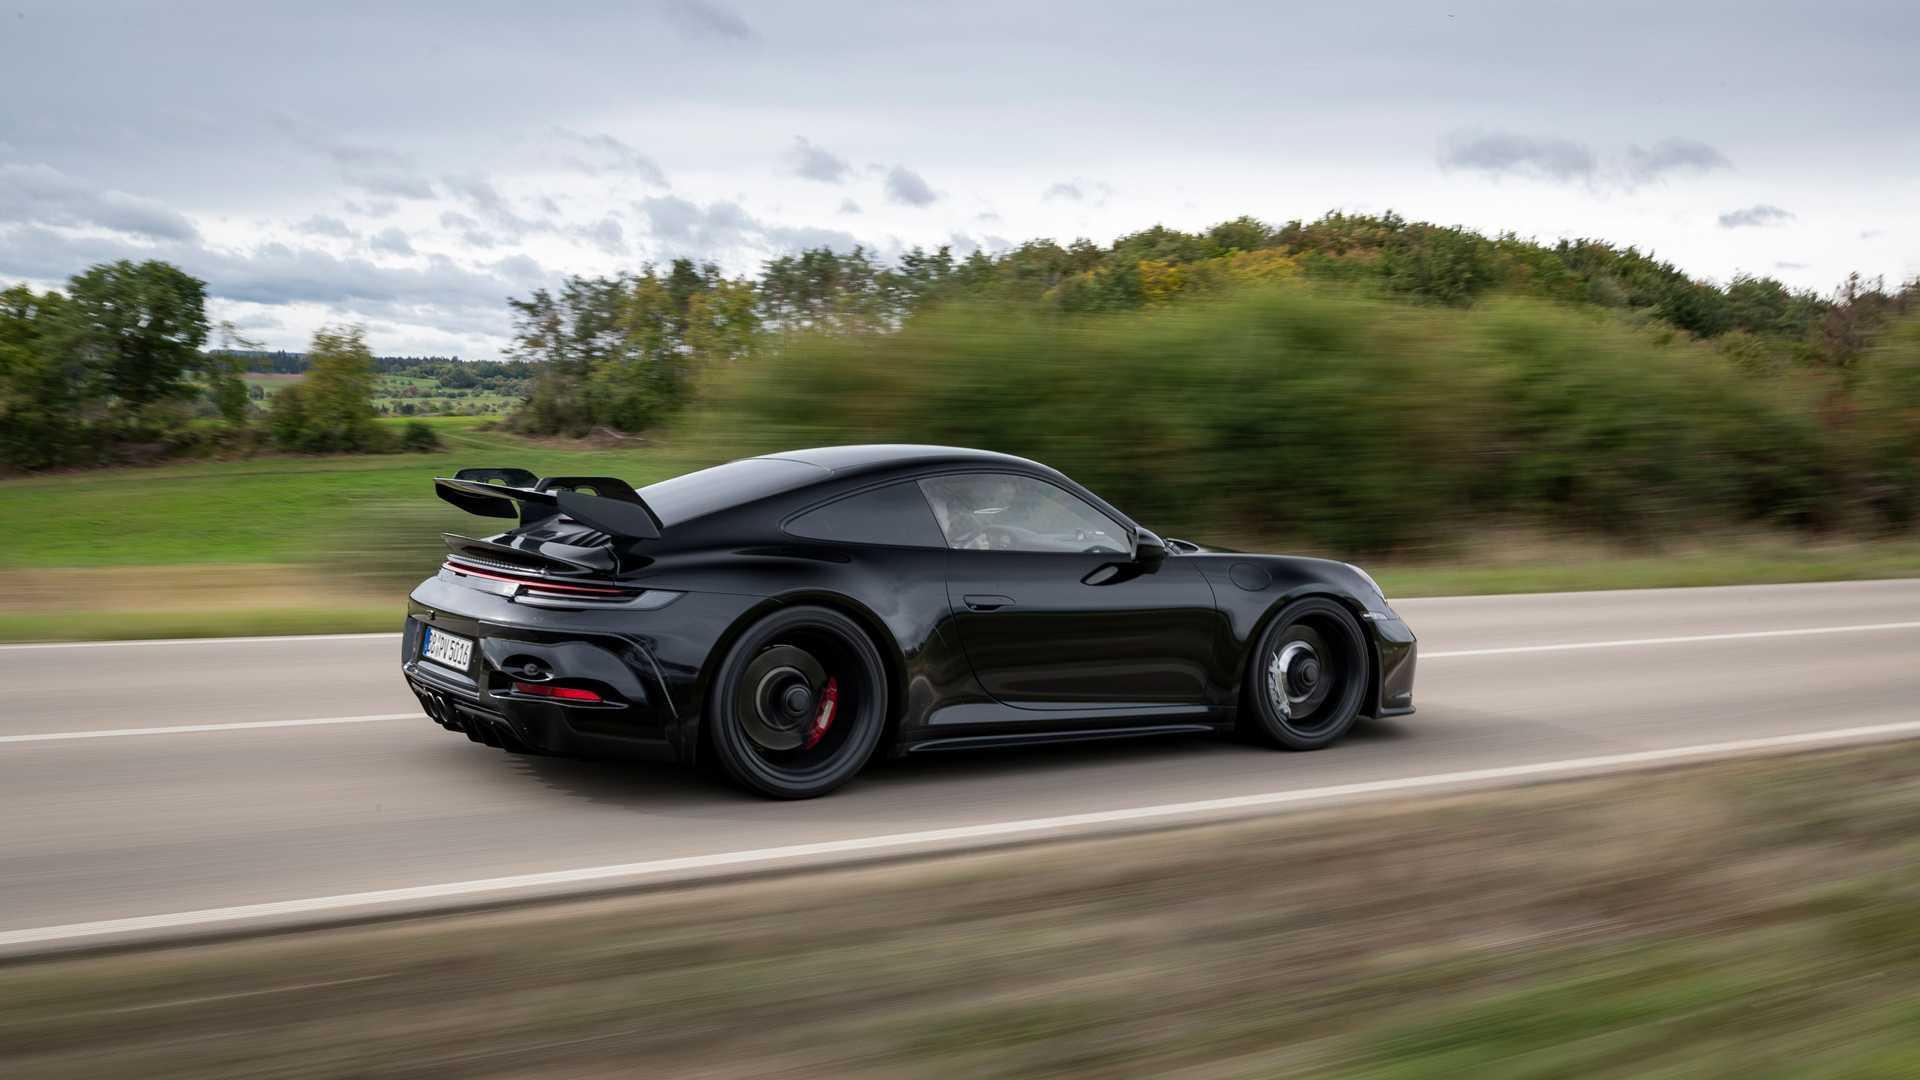 Porsche 992 GT3   2021 - Page 2 2021-porsche-911-gt3-prototype-rear-quarter-tracking